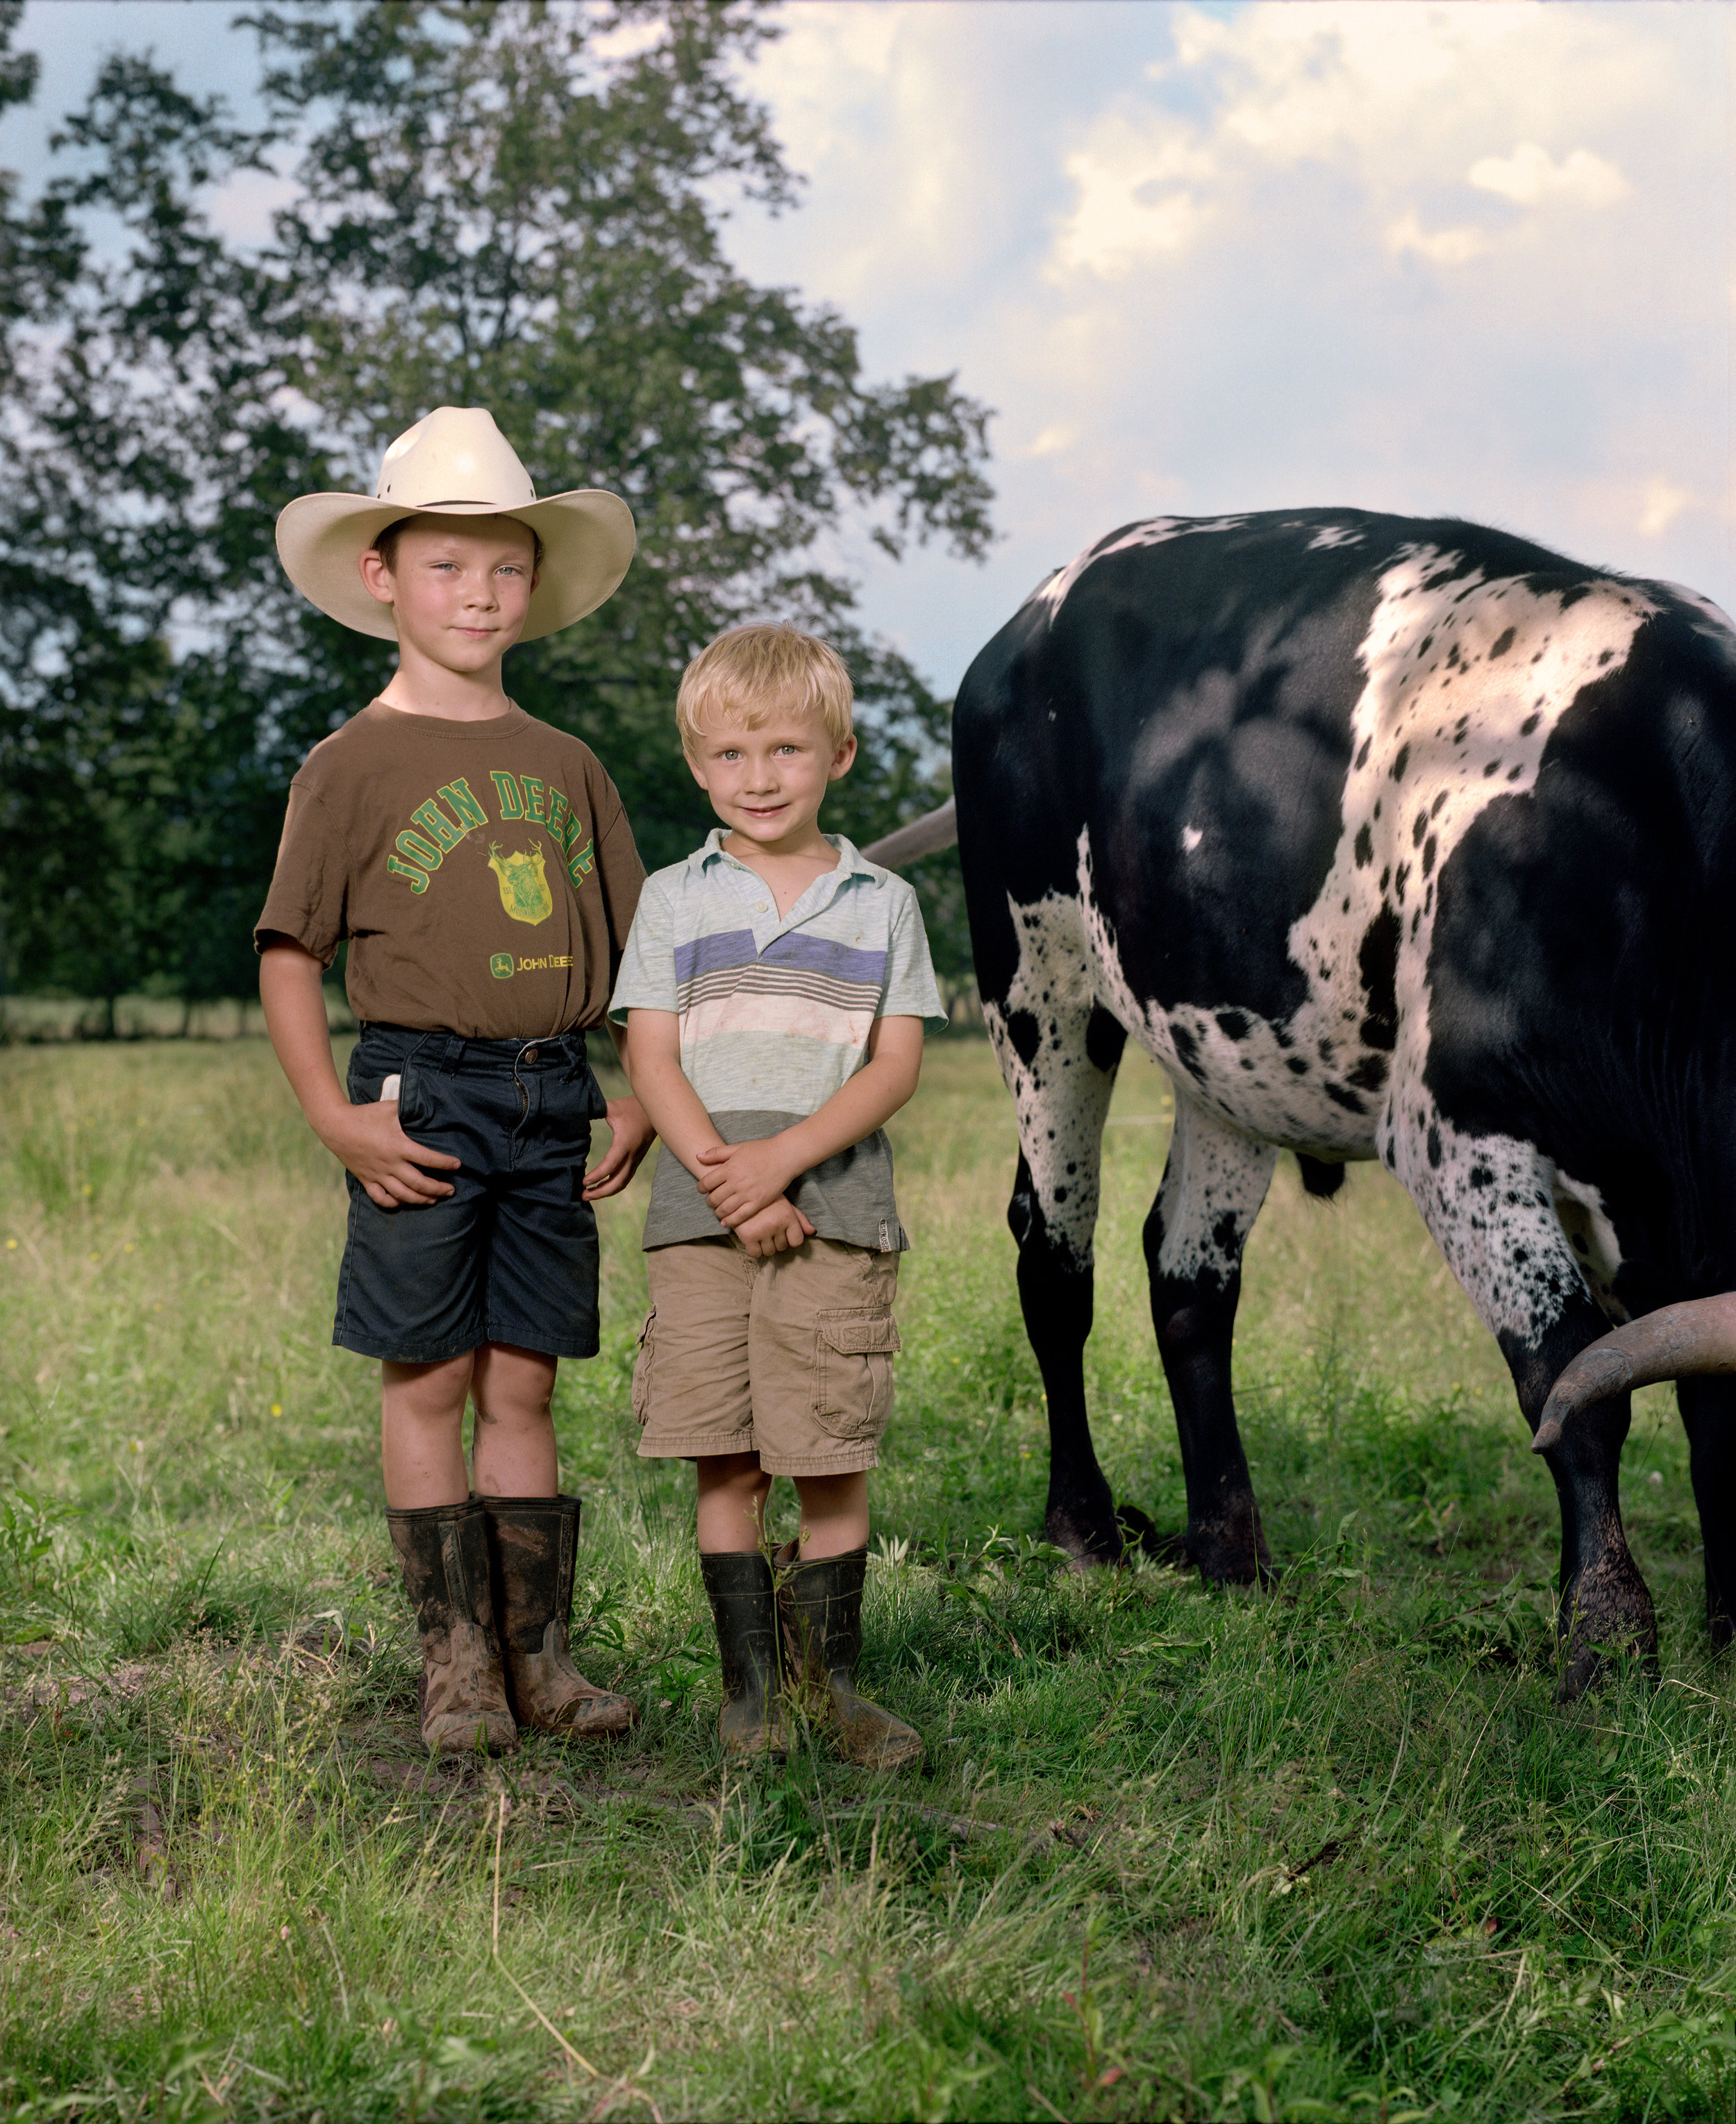 longhorn-kids_srgb.jpg